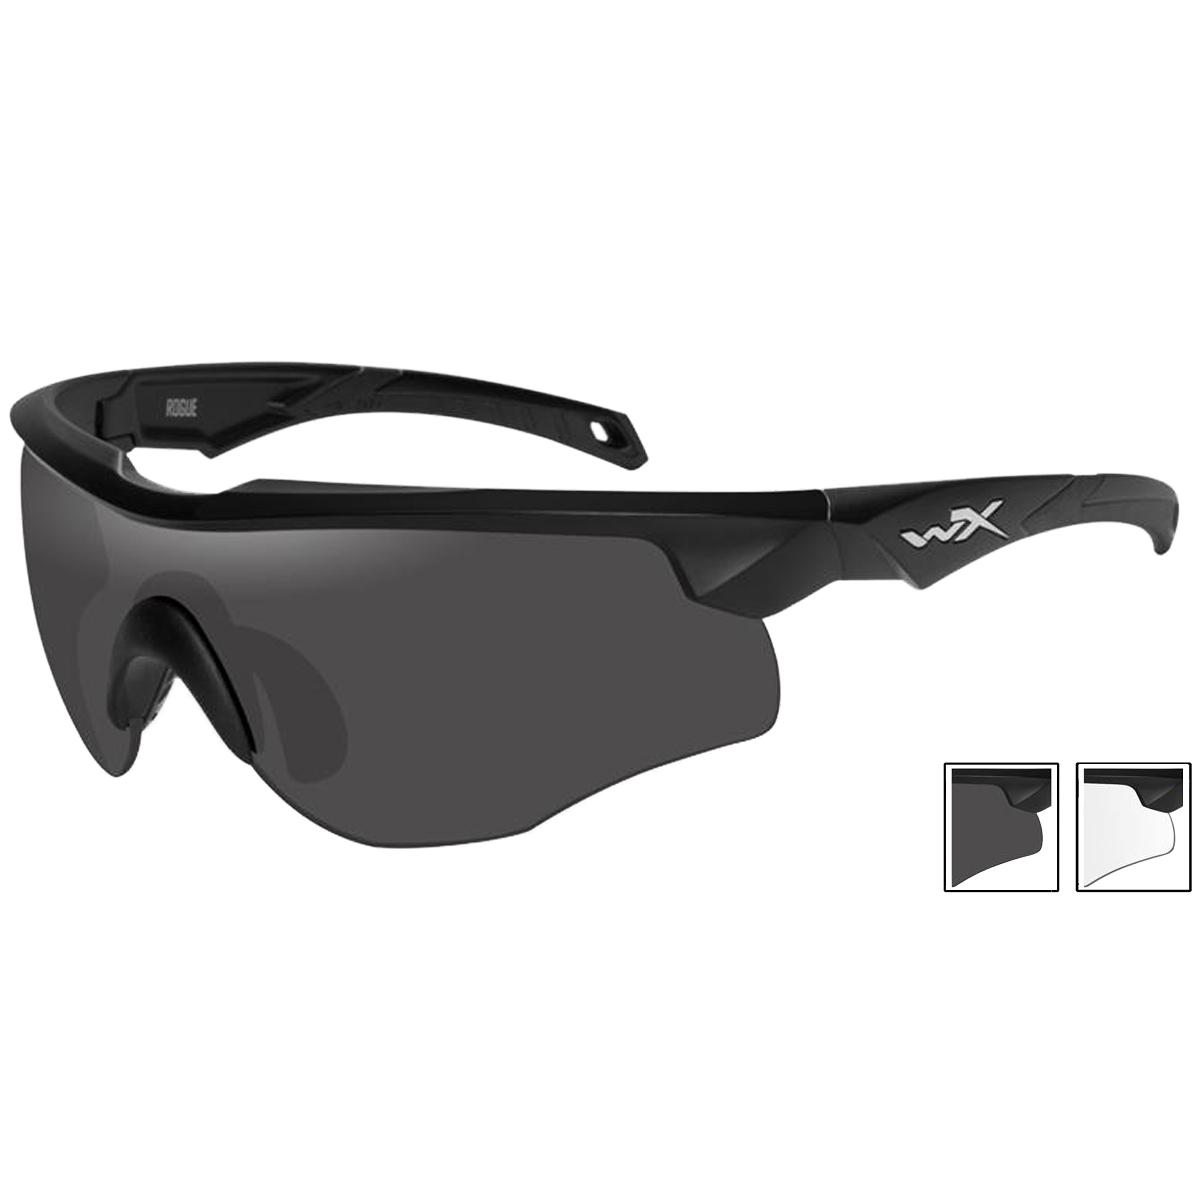 ae0b81db15e Details about Wiley X WX Rogue Glasses Ballistic Sport Smoke Grey Clear  Lens Matte Black Frame